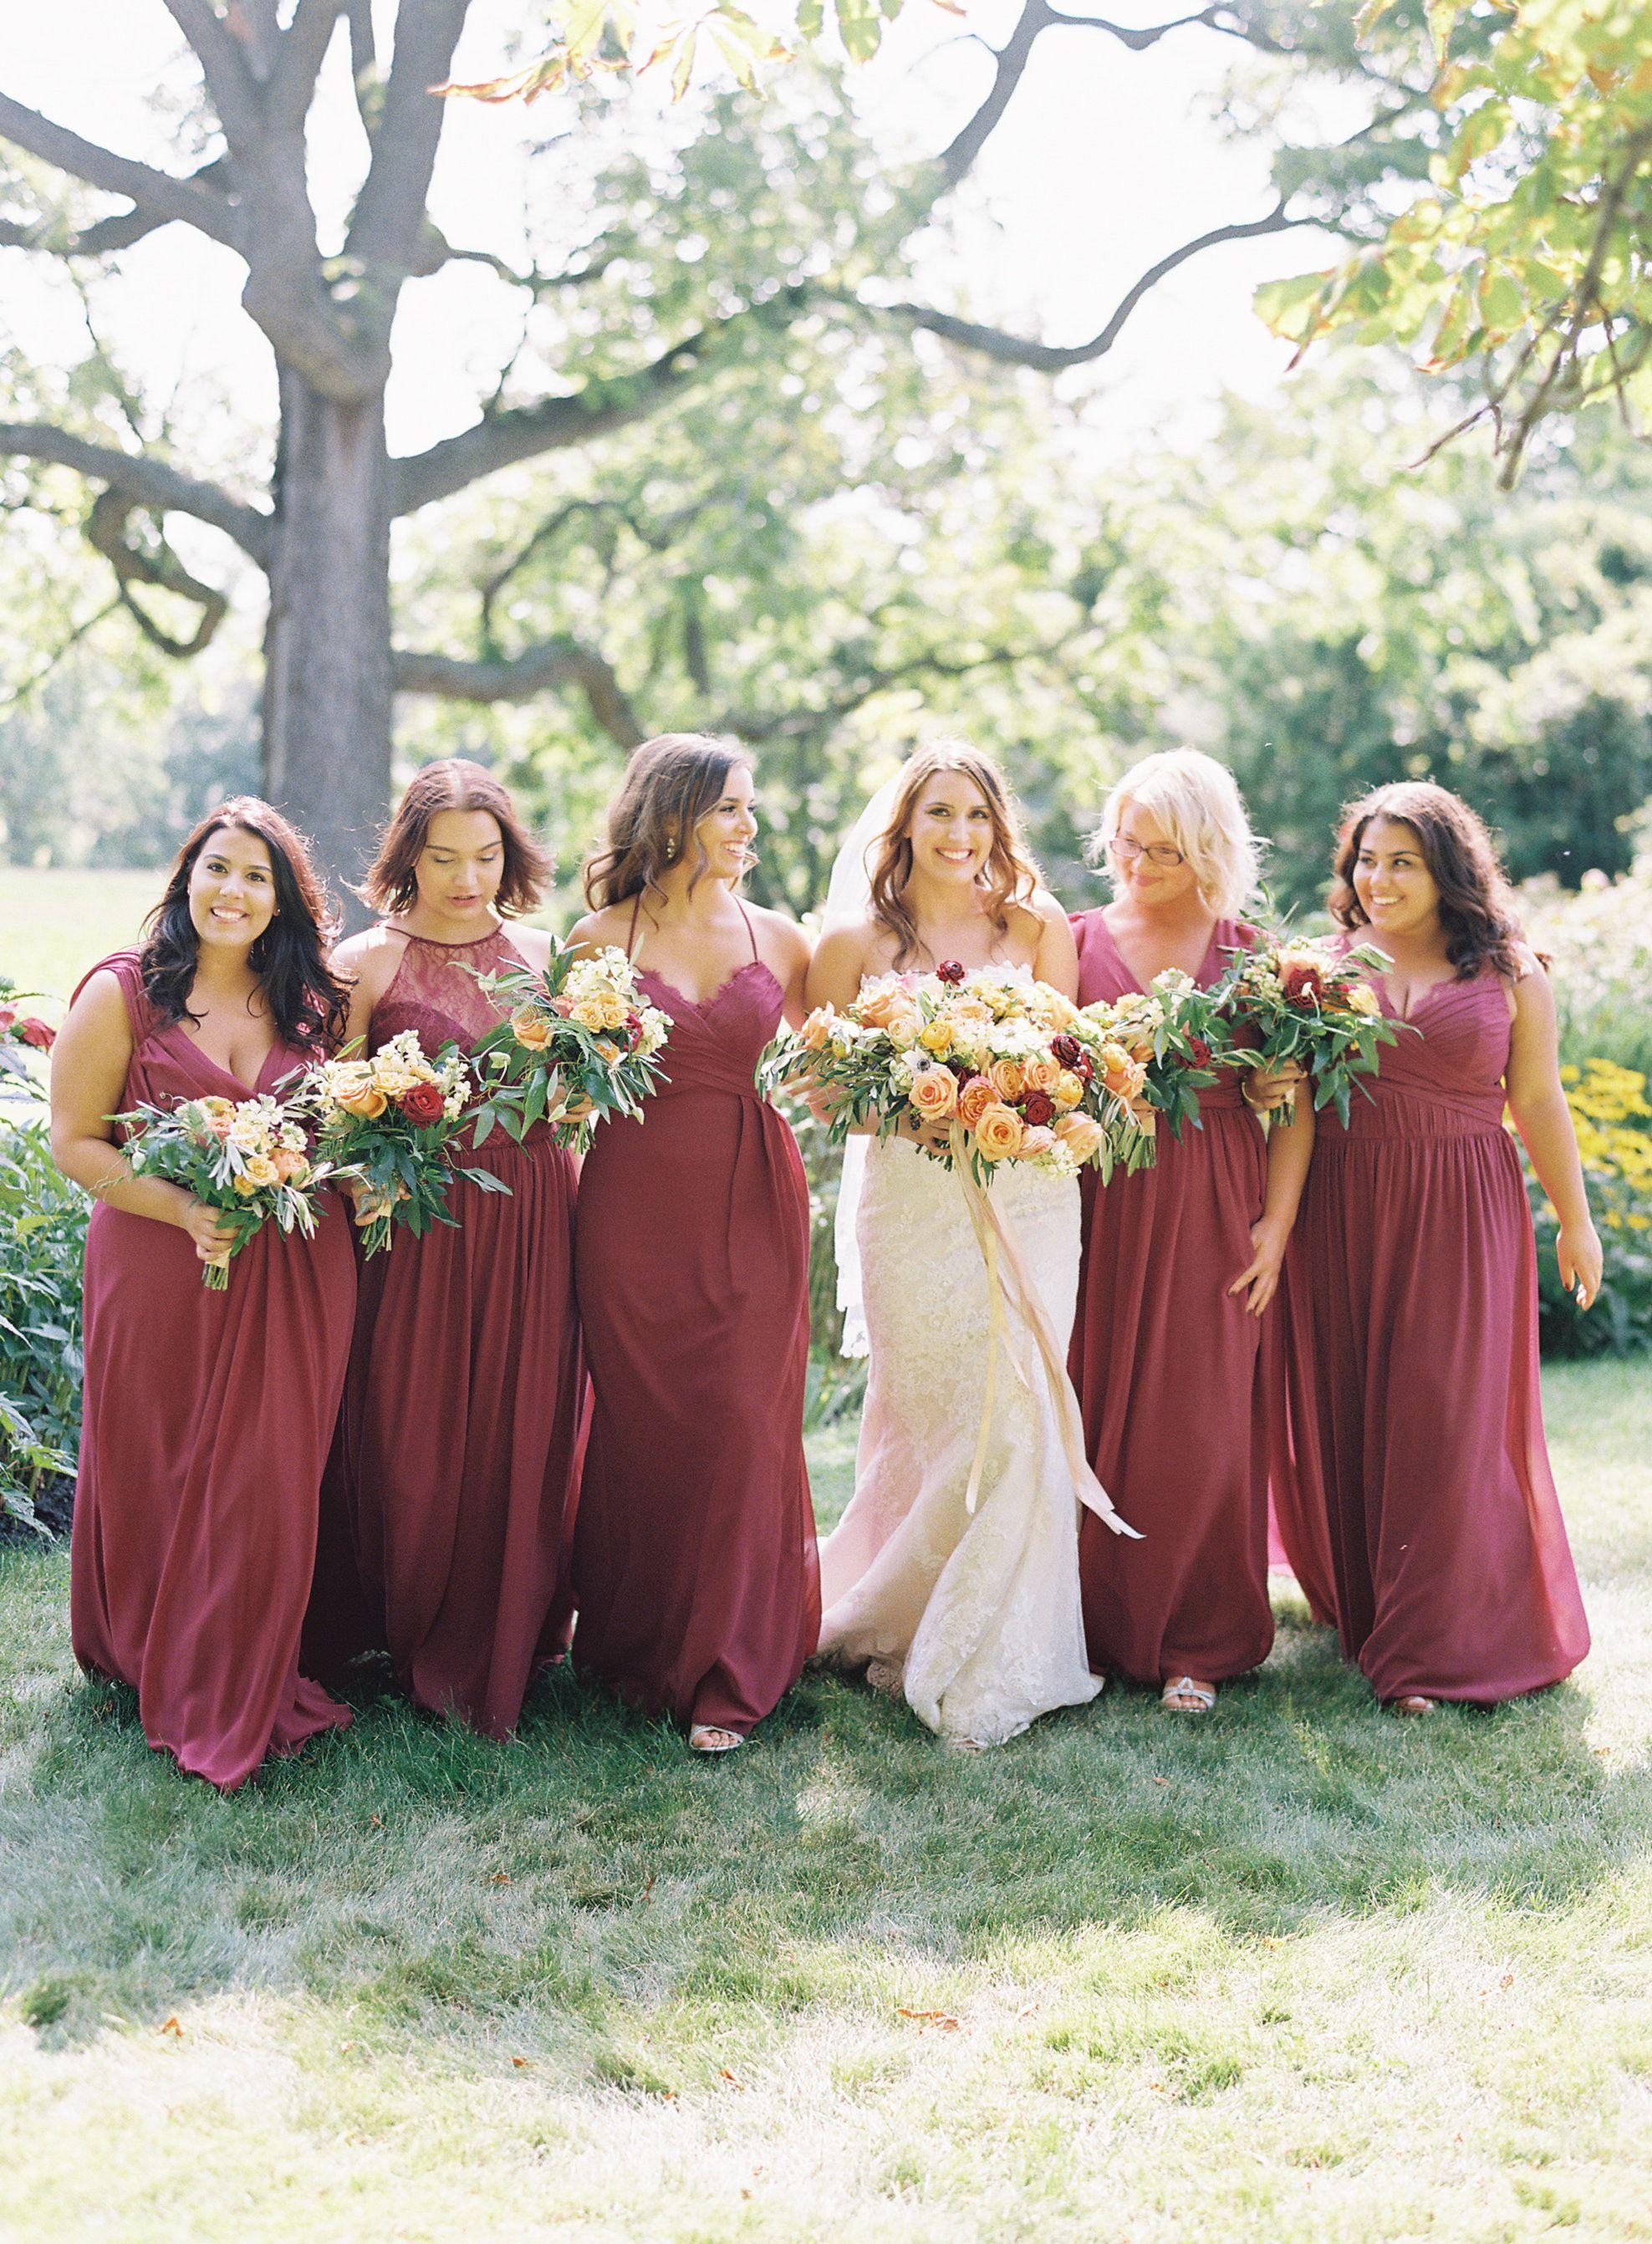 Vineyard Wedding Inspired By The Couple S Honeymoon Destination